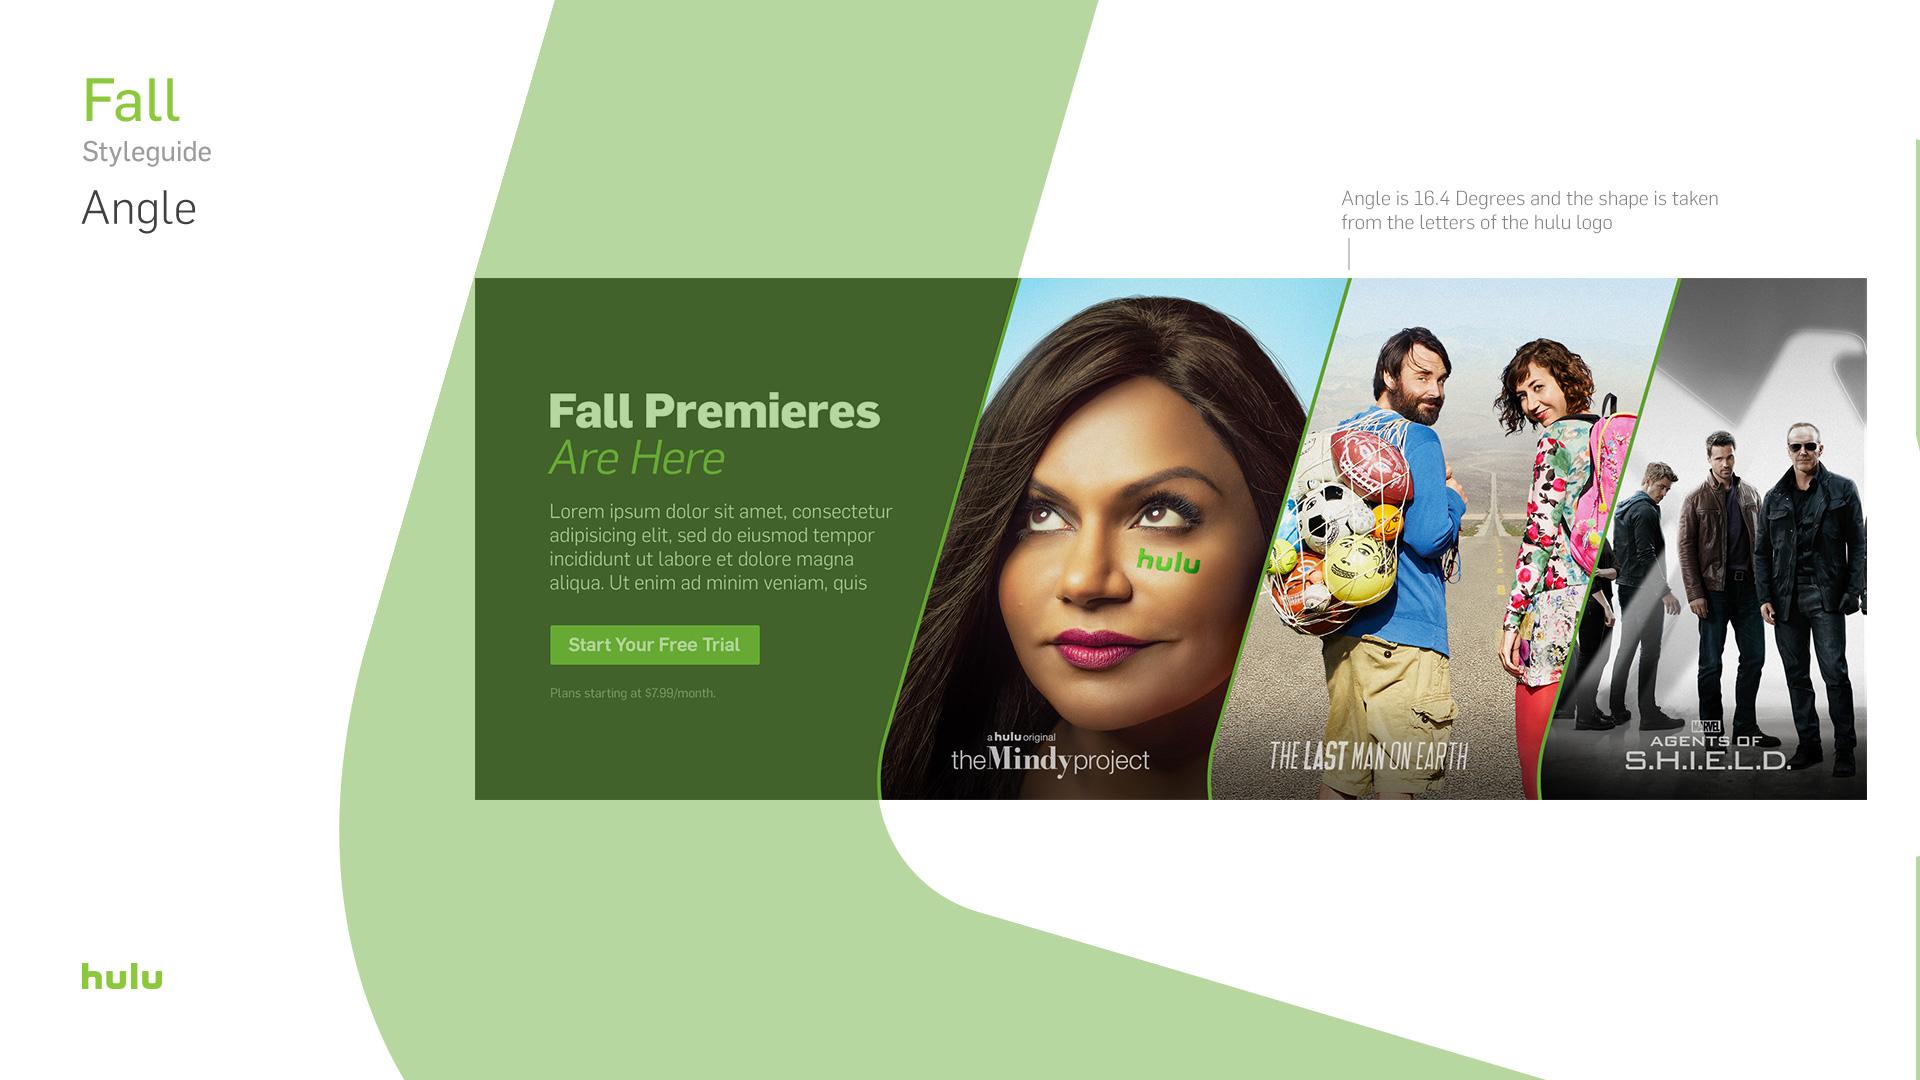 fall-styleguide-v2_Page_09.jpg